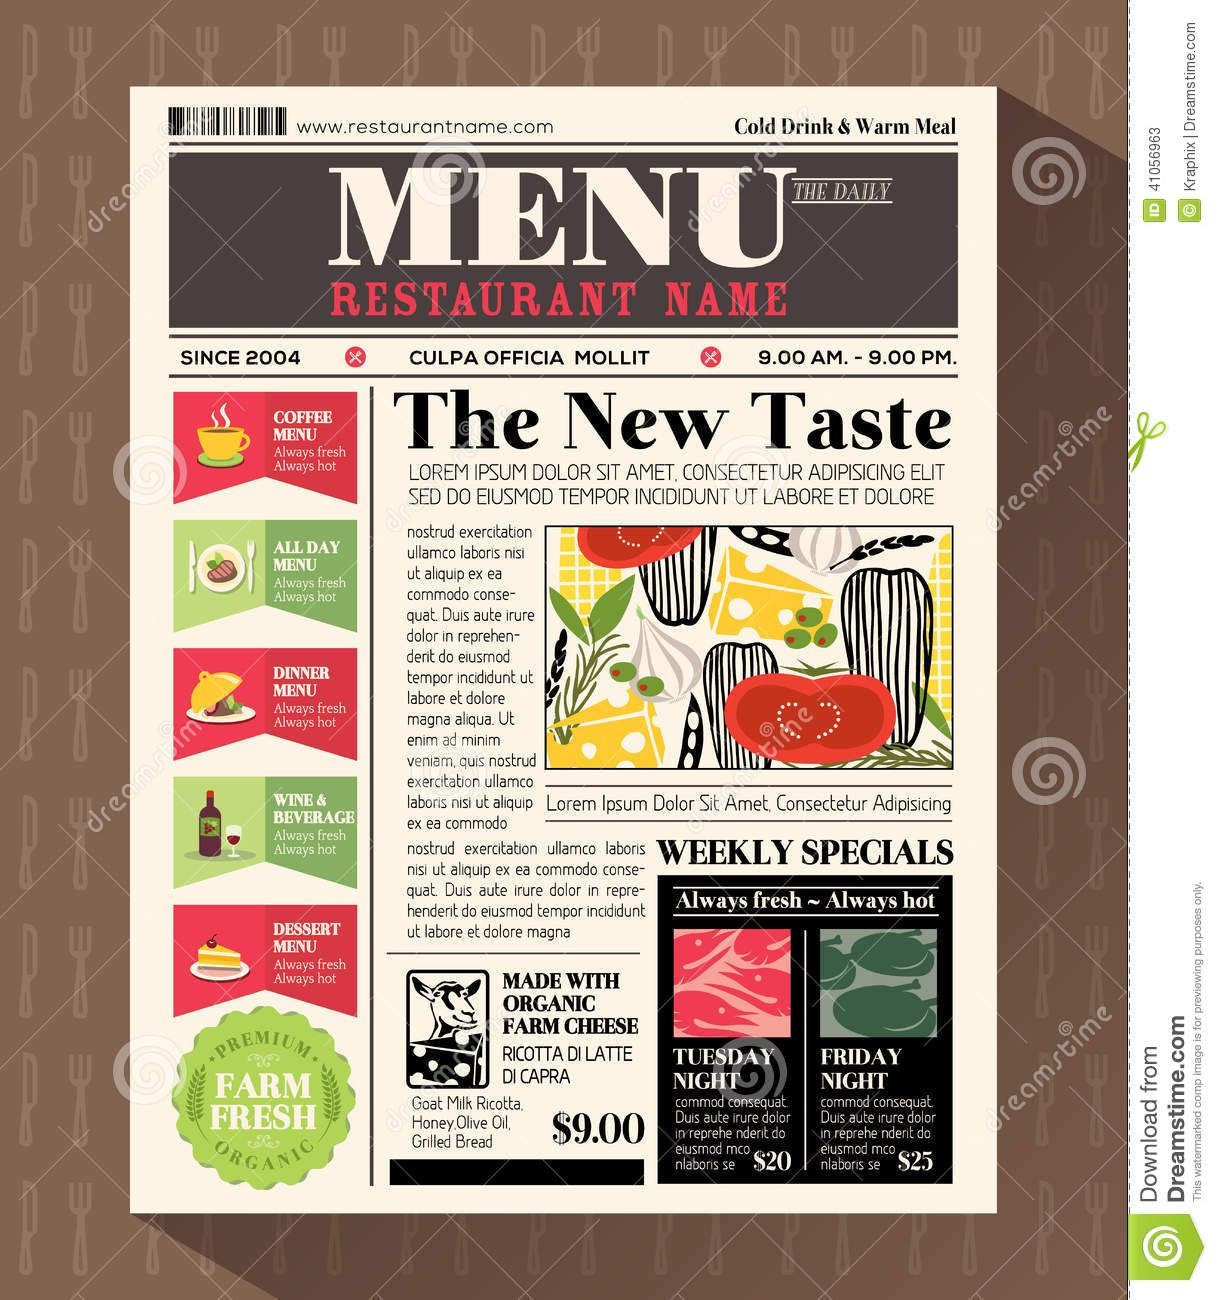 Newspaper style design google menu pinterest newspaper restaurant menu design template in newspaper style vector by kraphix on vectorstock saigontimesfo